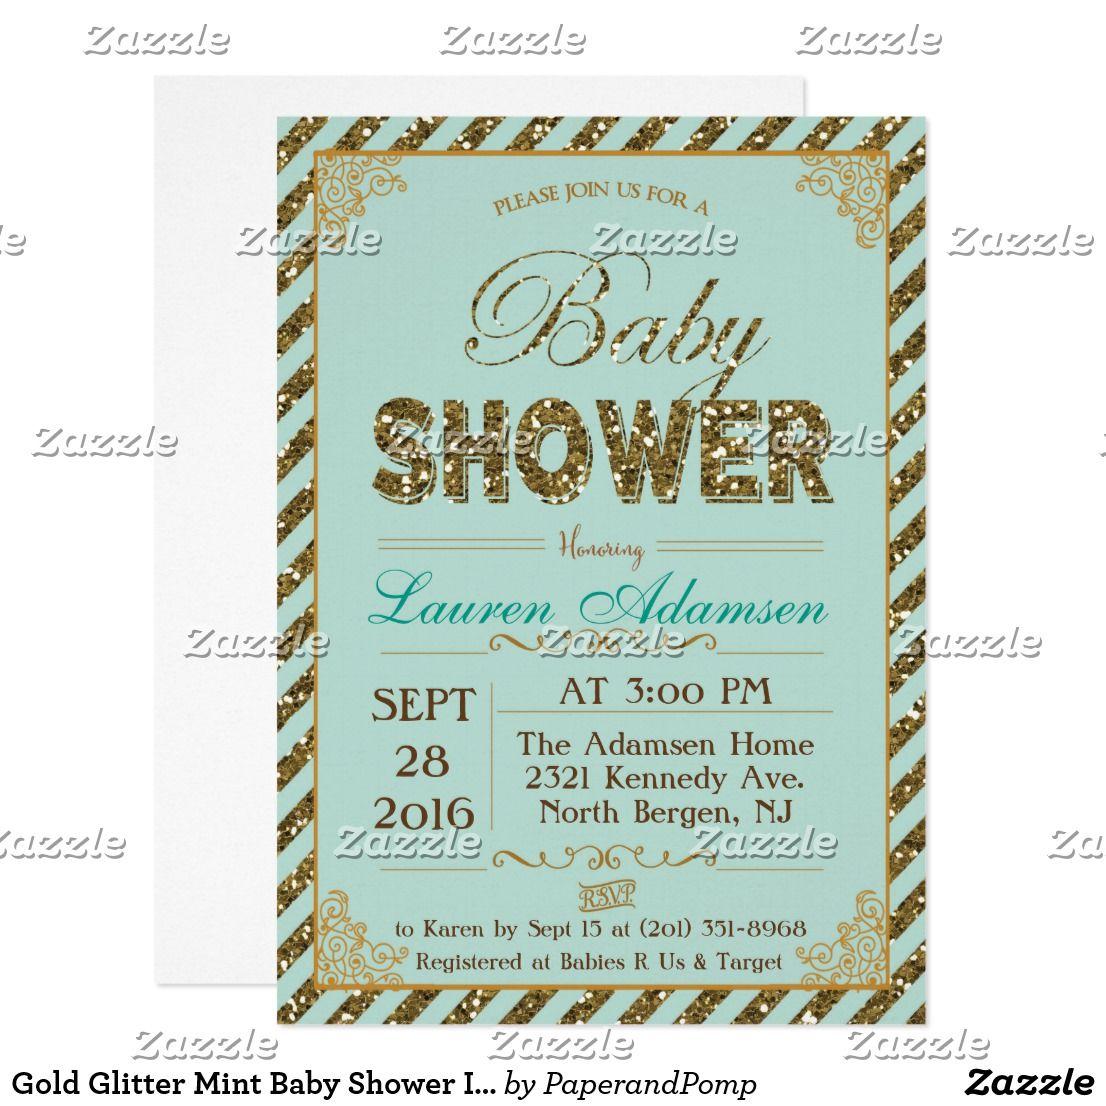 Gold Glitter Mint Baby Shower Invitation | { Oh Baby! - Shower Ideas ...